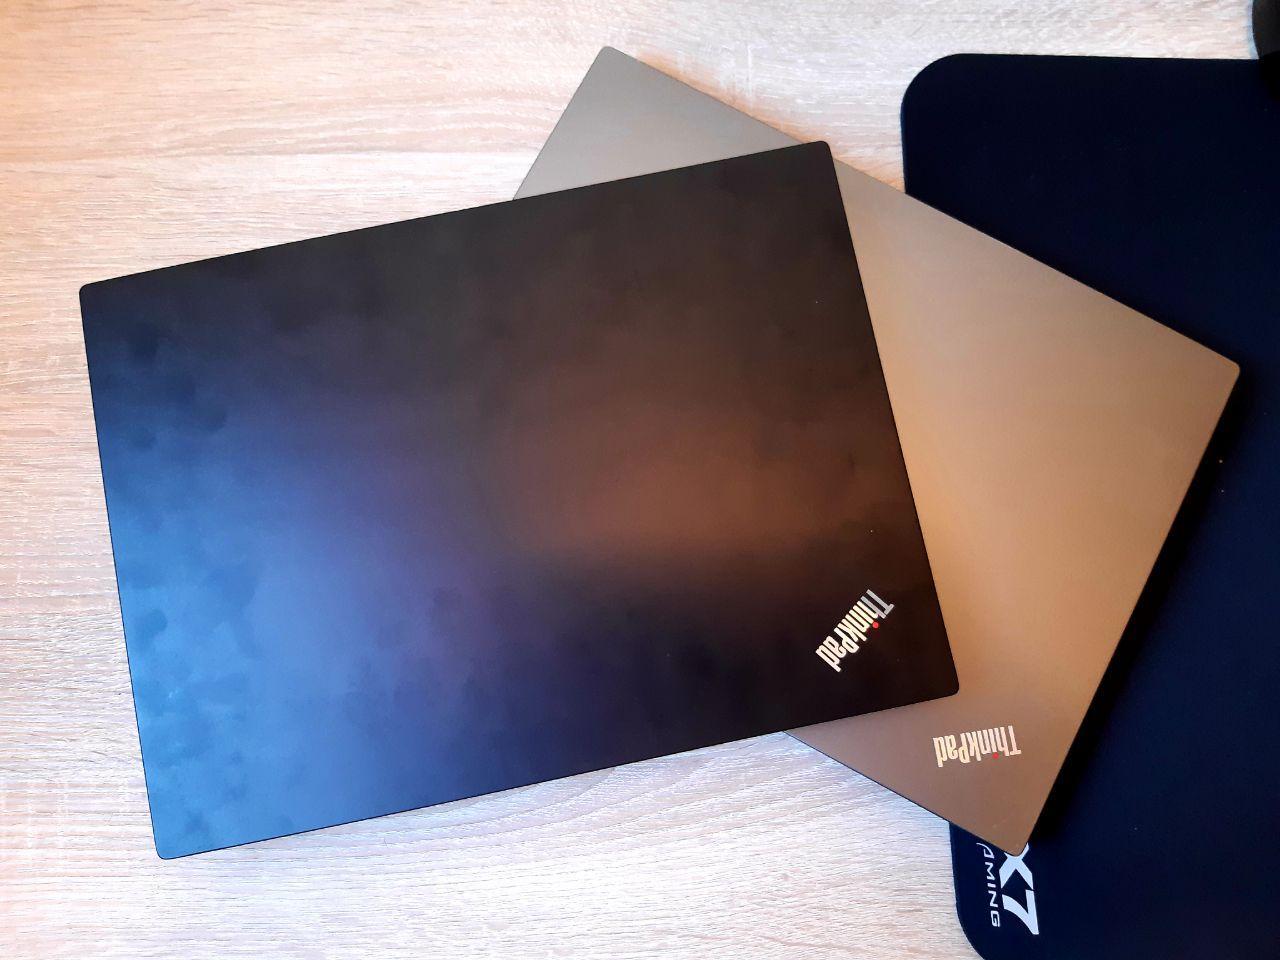 ThinkPad E480 Intel на Windows VS ThinkPad E495 AMD на Ubuntu есть ли разница? - 1